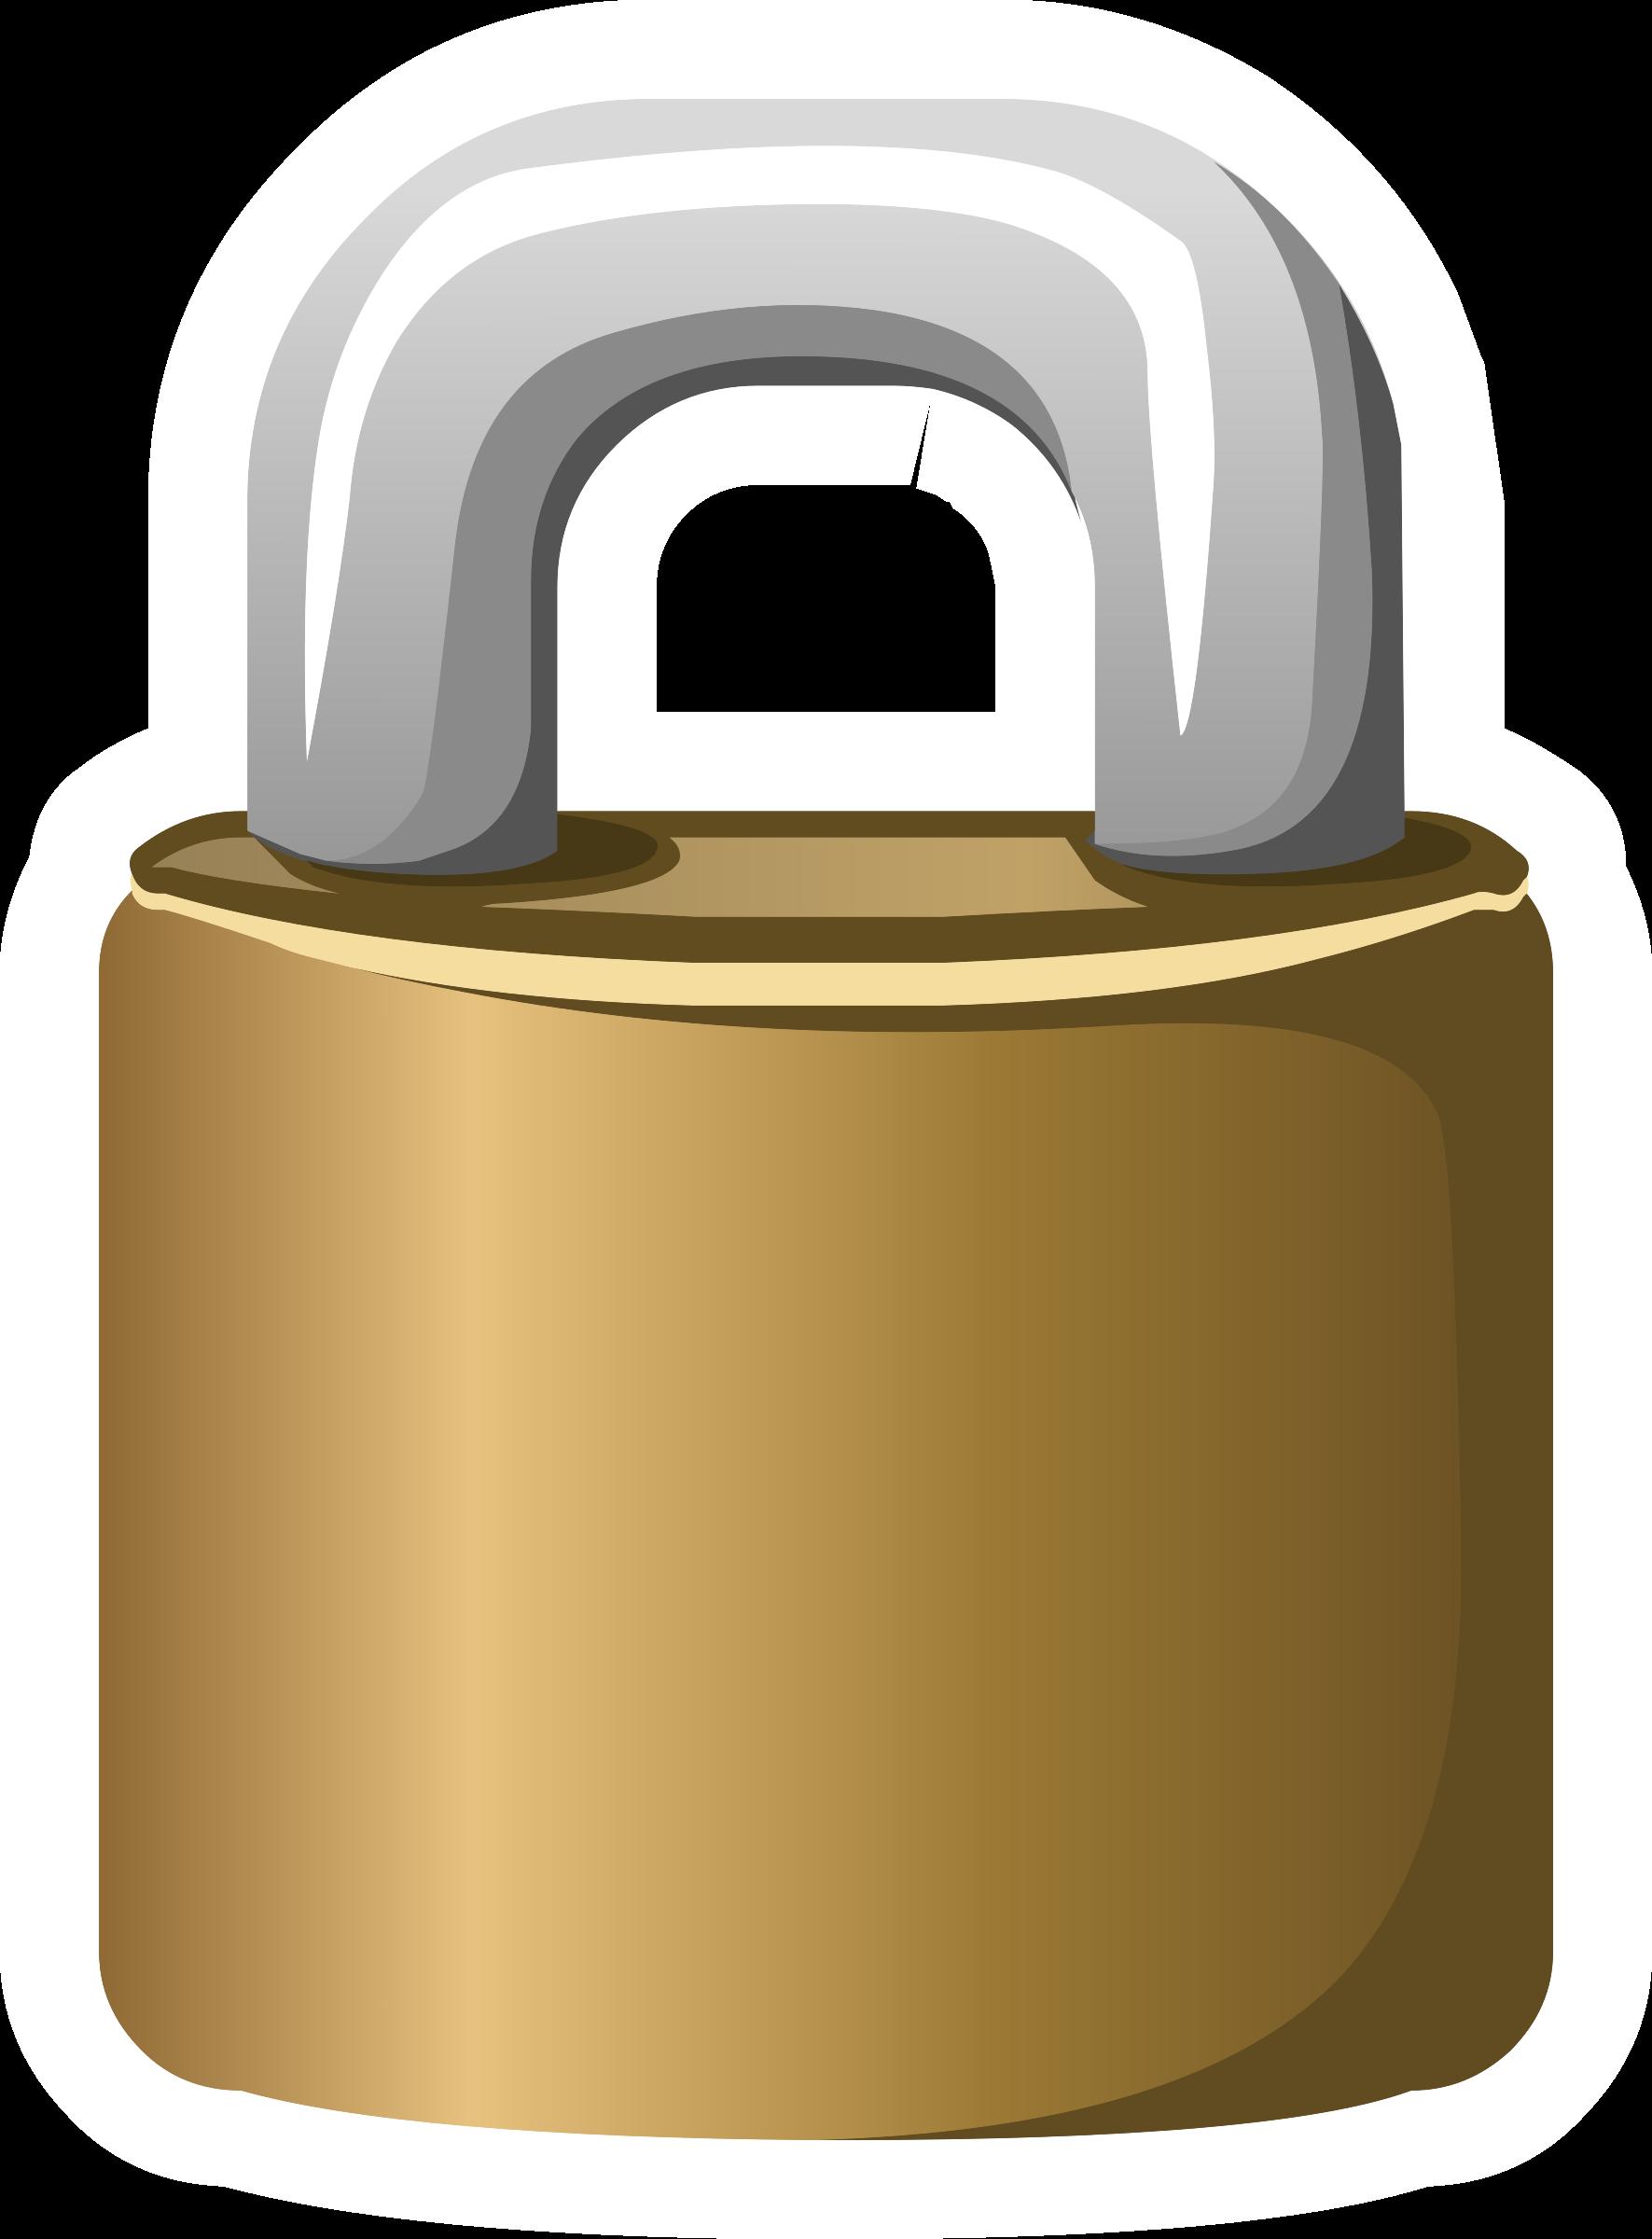 Lock clipart metal. Misc crown game big